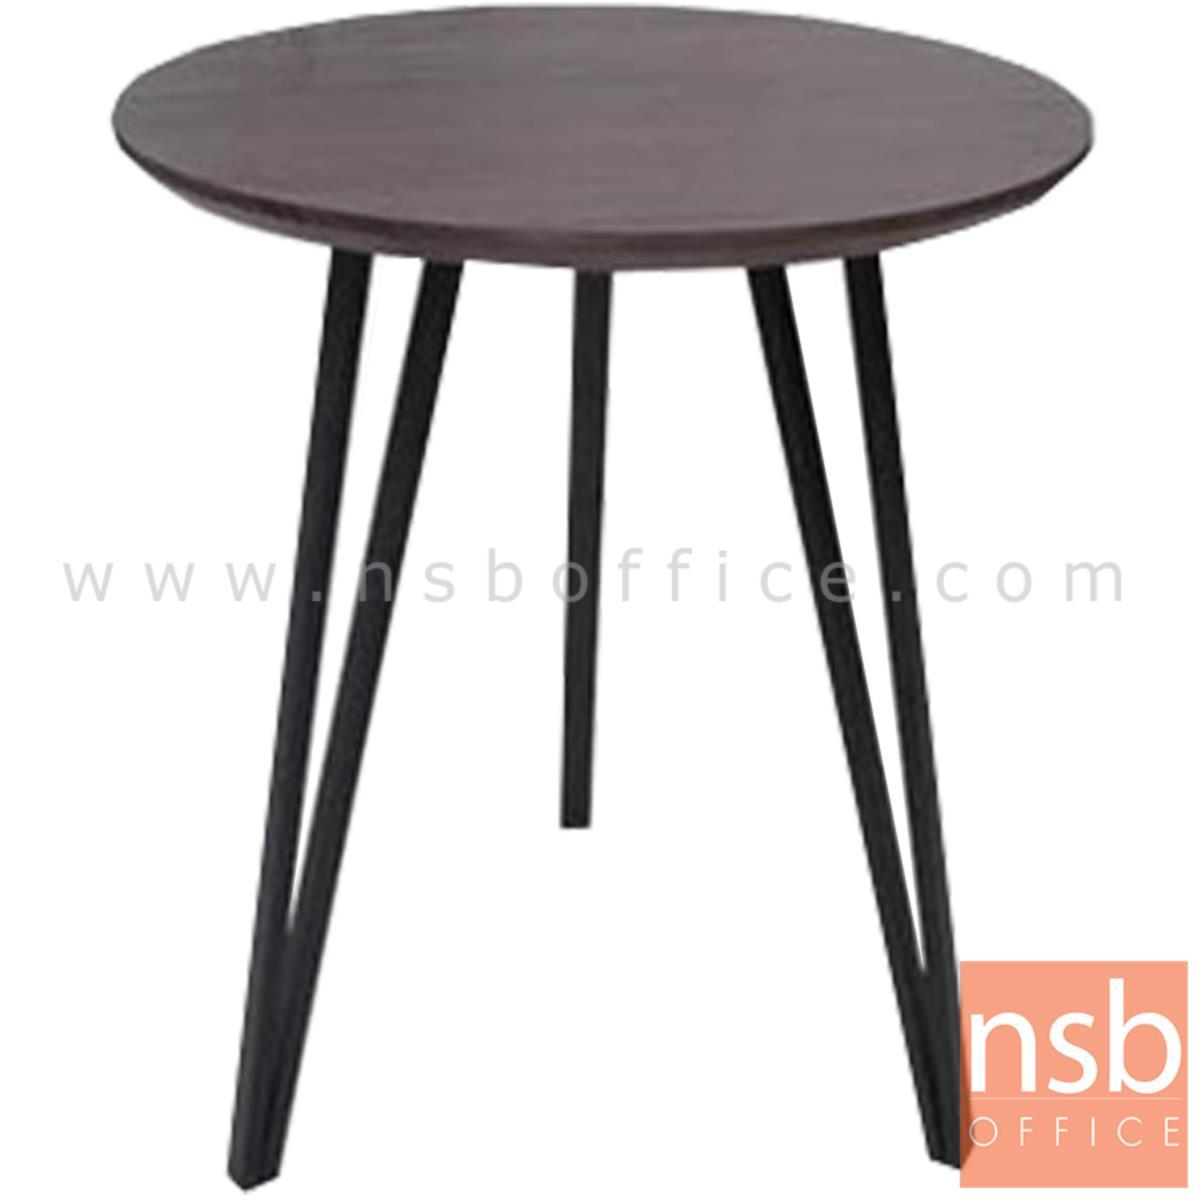 A14A231:โต๊ะกลมหน้าไม้ รุ่น CACERES (กาเซเรส) ขนาด 60Di cm. ขาเหล็ก